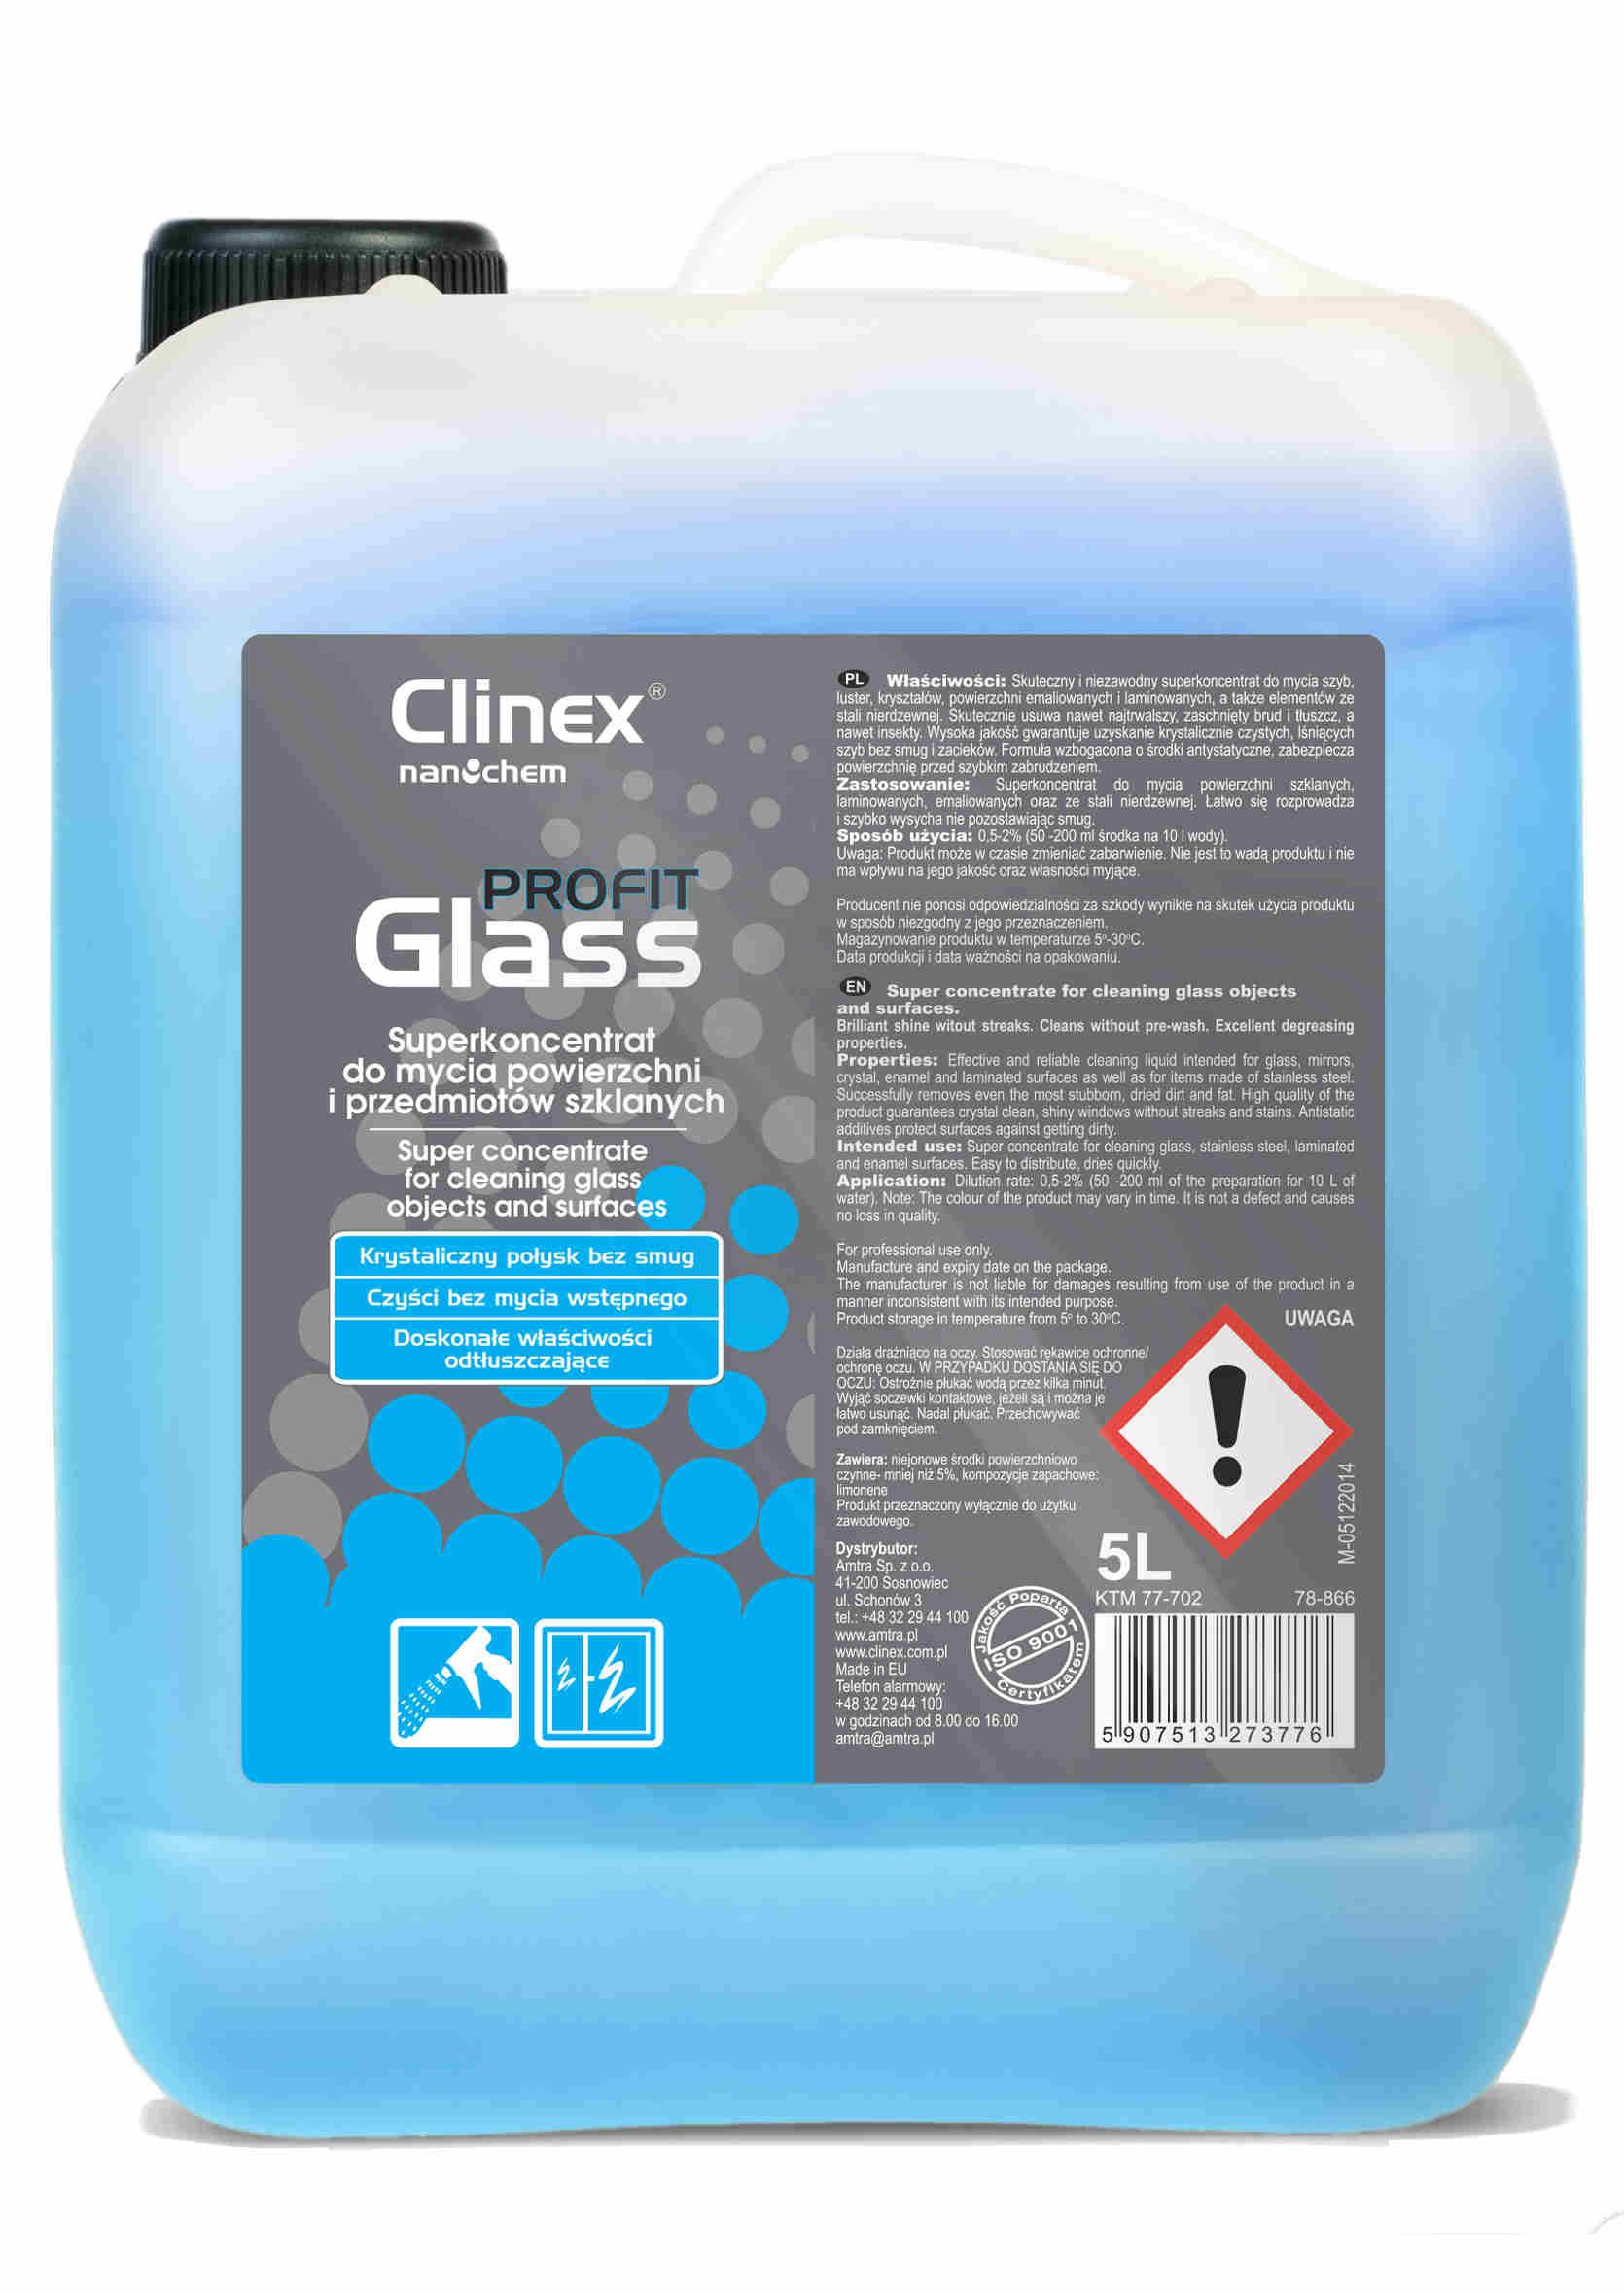 Clinex Profit Glass 5L Koncentrat do Mycia Szyb i Szkła